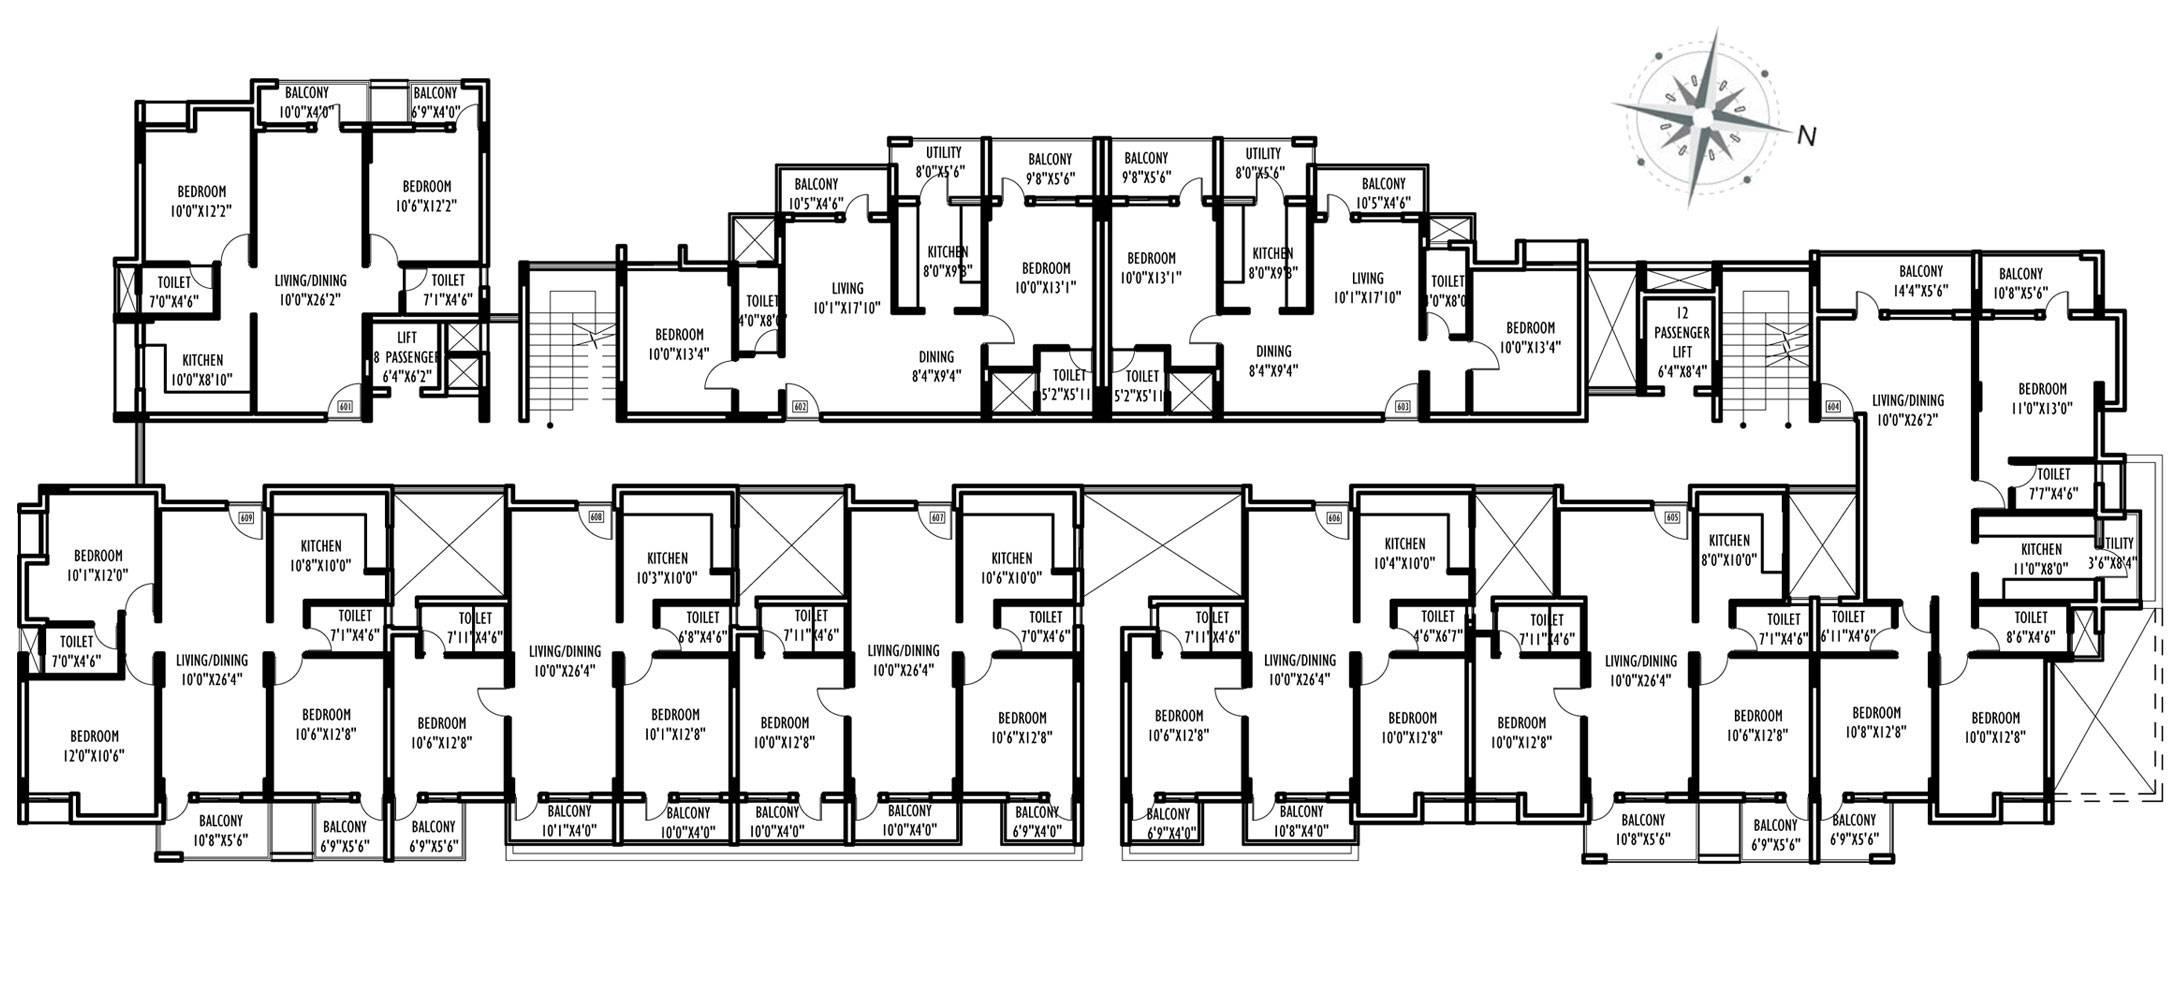 Compound House Plans Floor Plan House Plans 60260